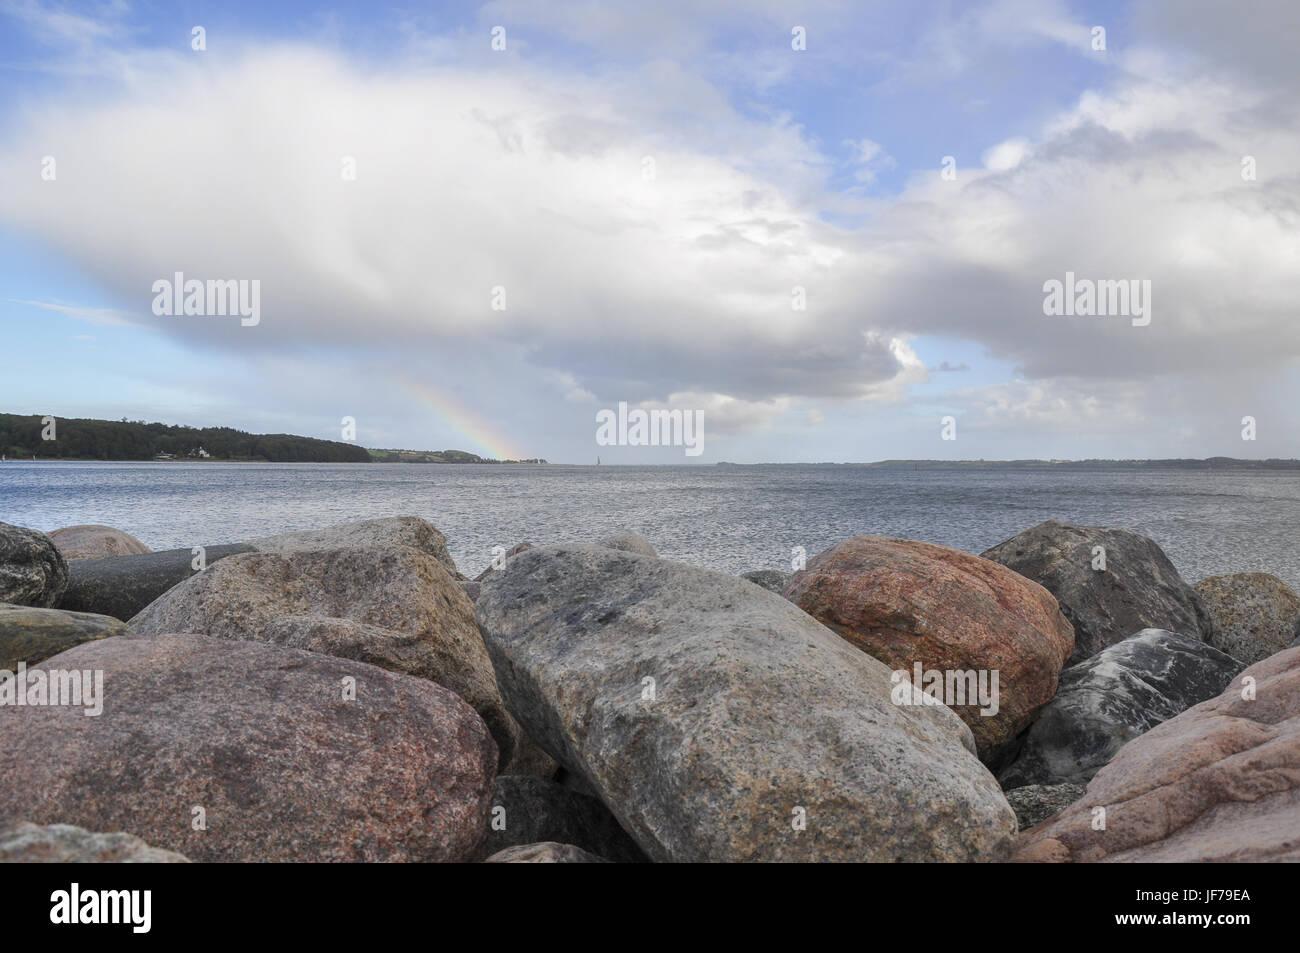 Cerca del mar Báltico, Aabenra Danmark Foto de stock